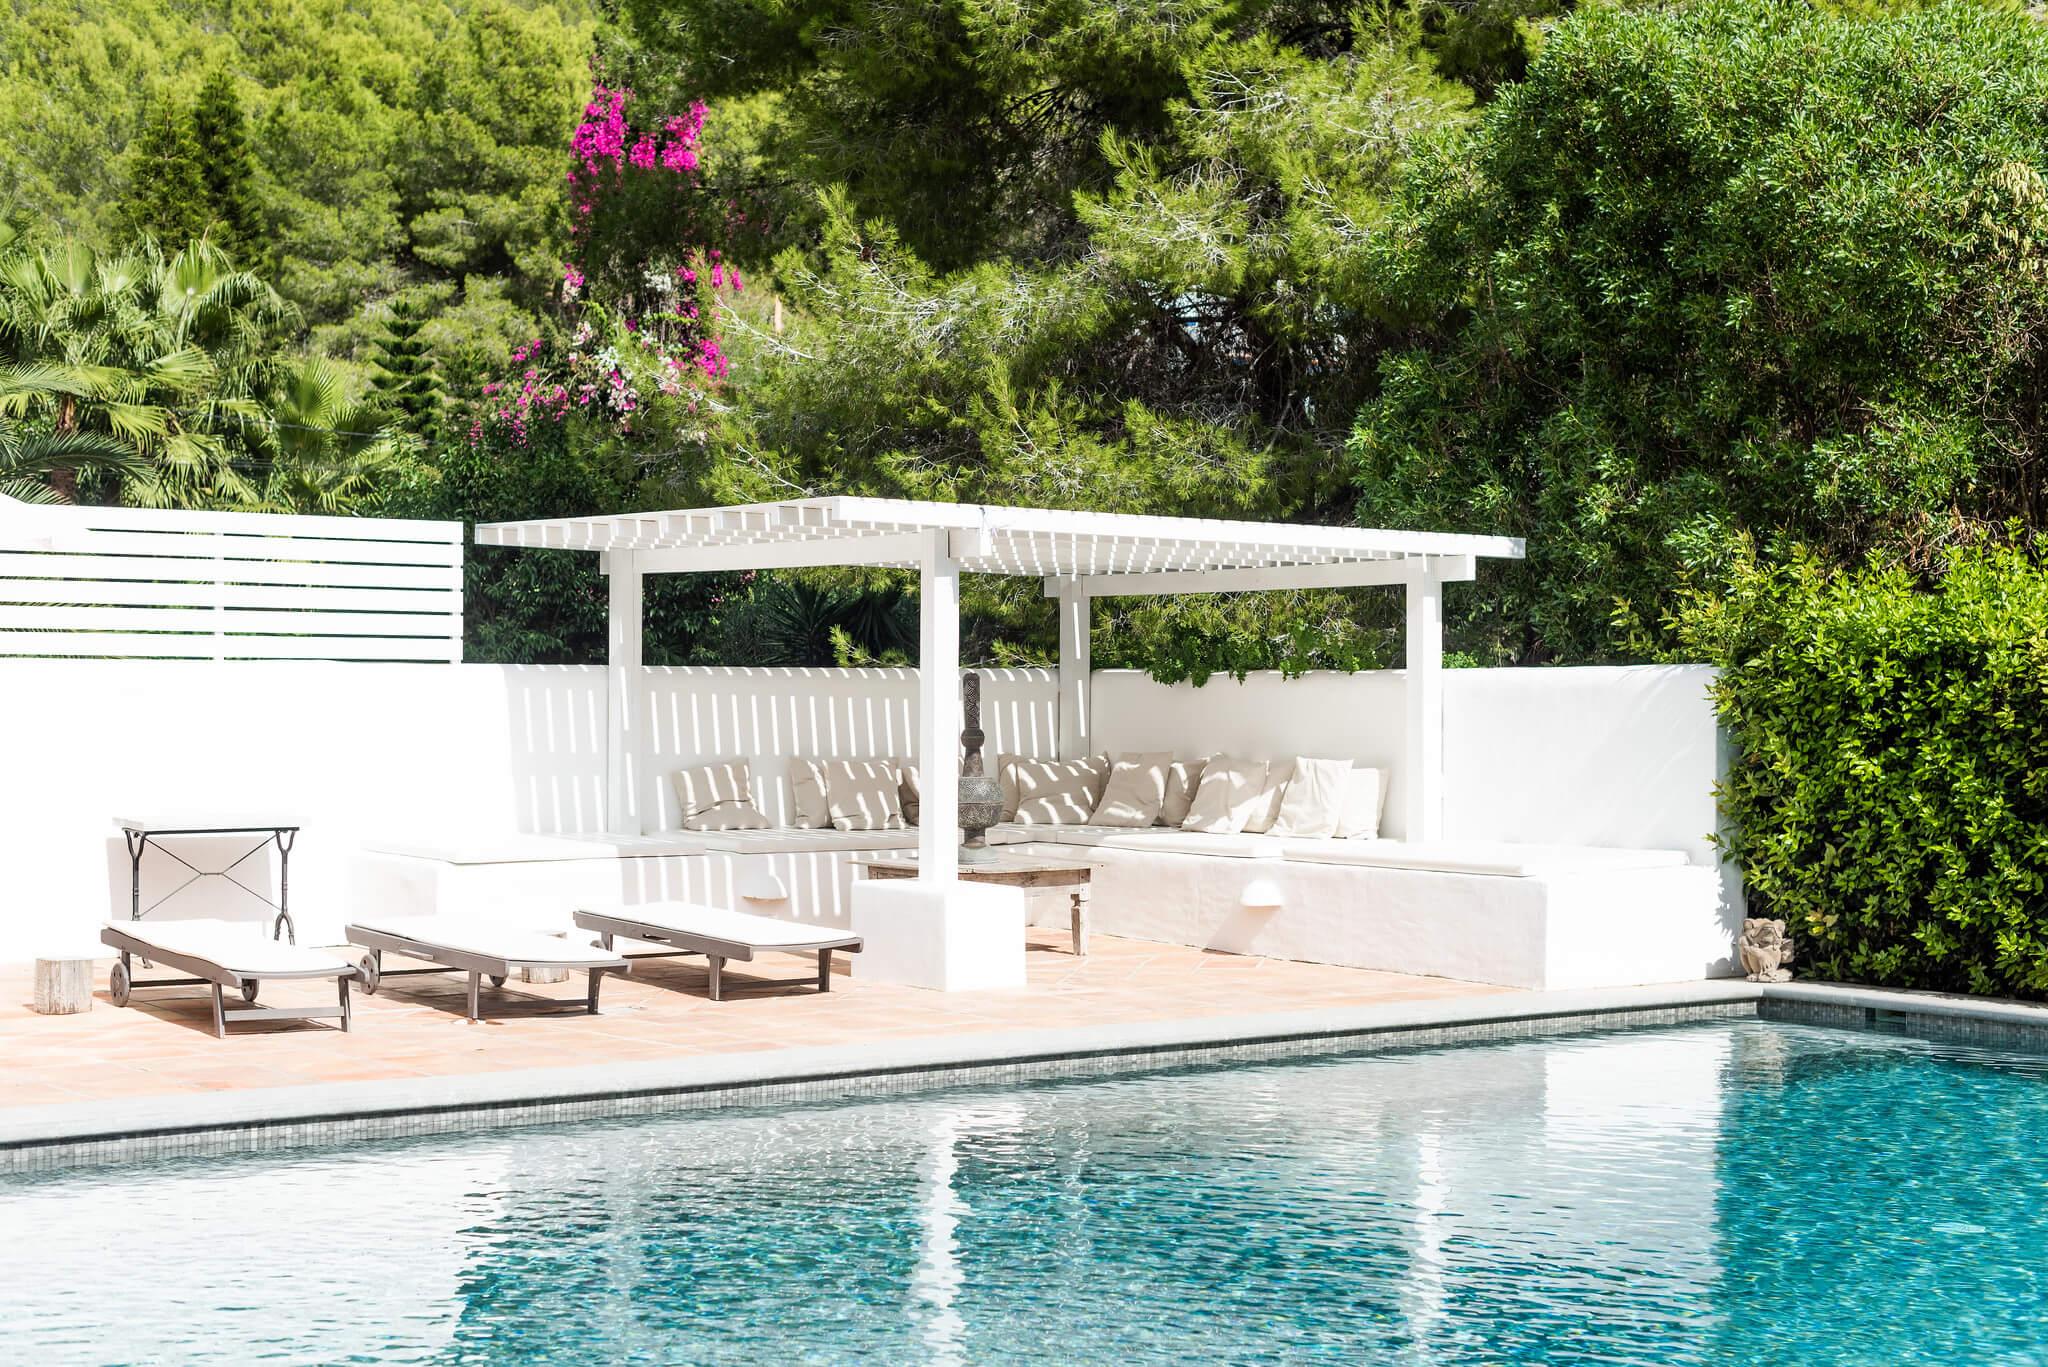 https://www.white-ibiza.com/wp-content/uploads/2020/05/white-ibiza-villas-can-lyra-across-the-pool.jpg